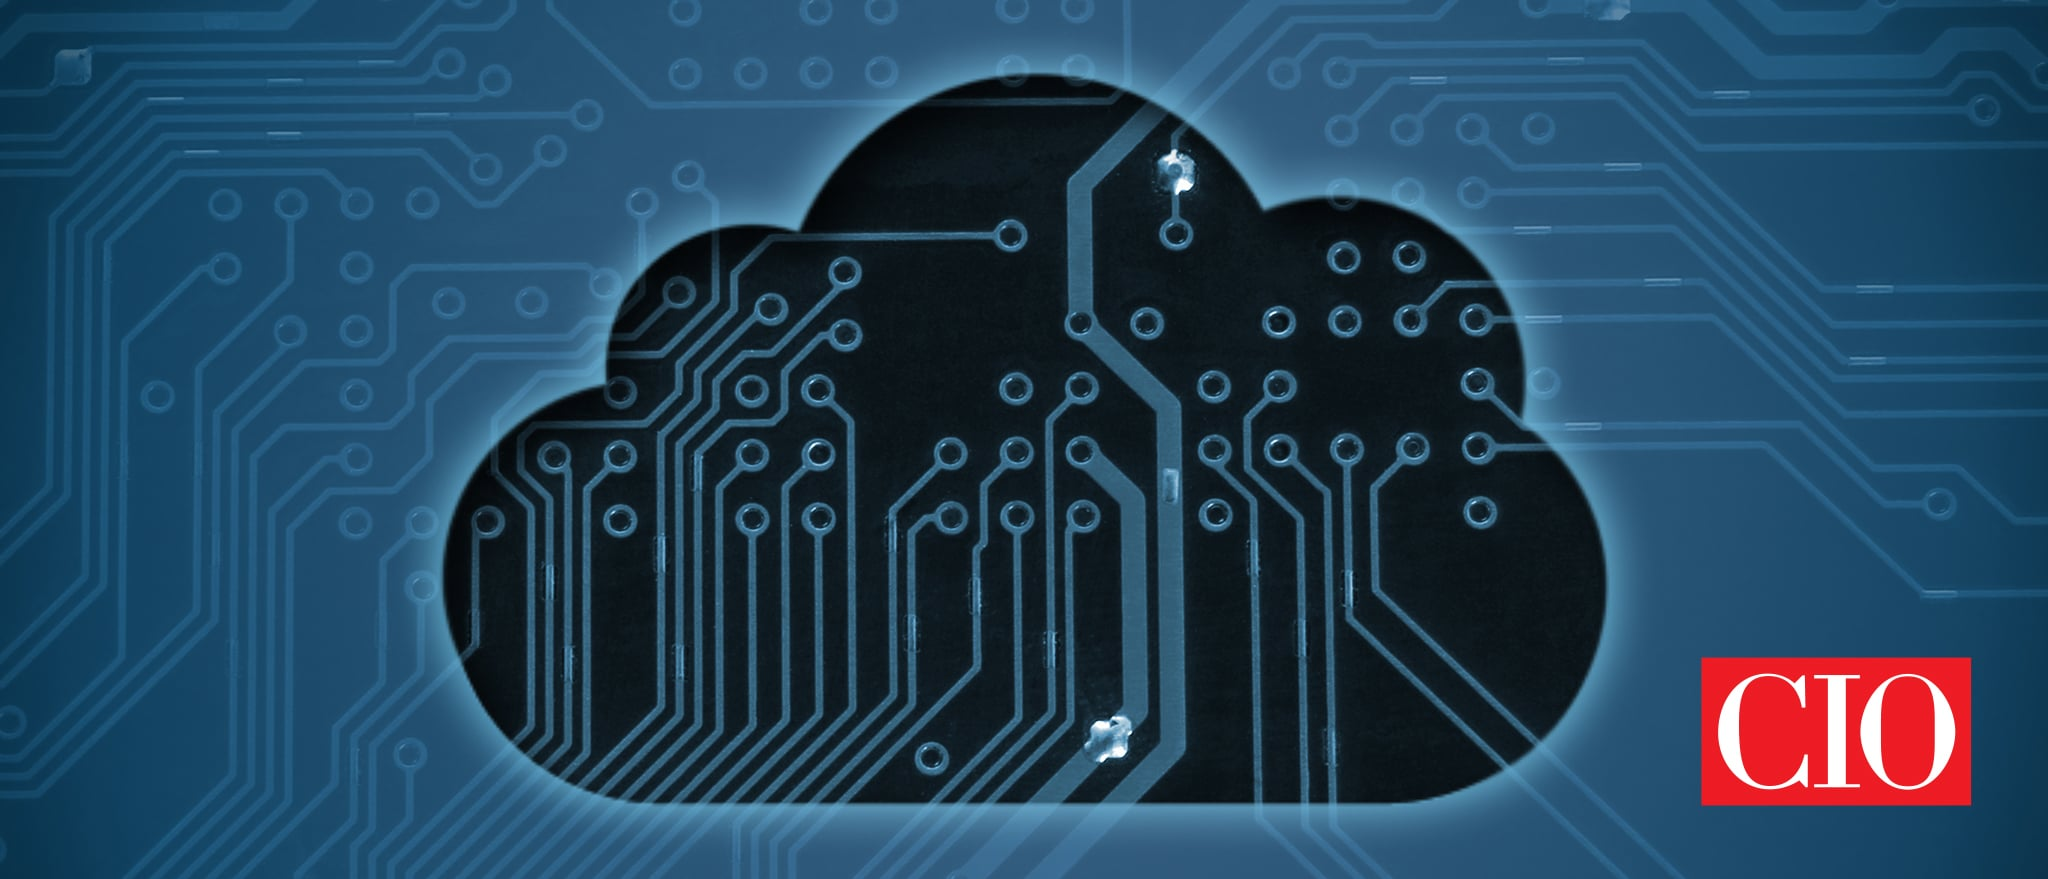 Cloud on a circuit board